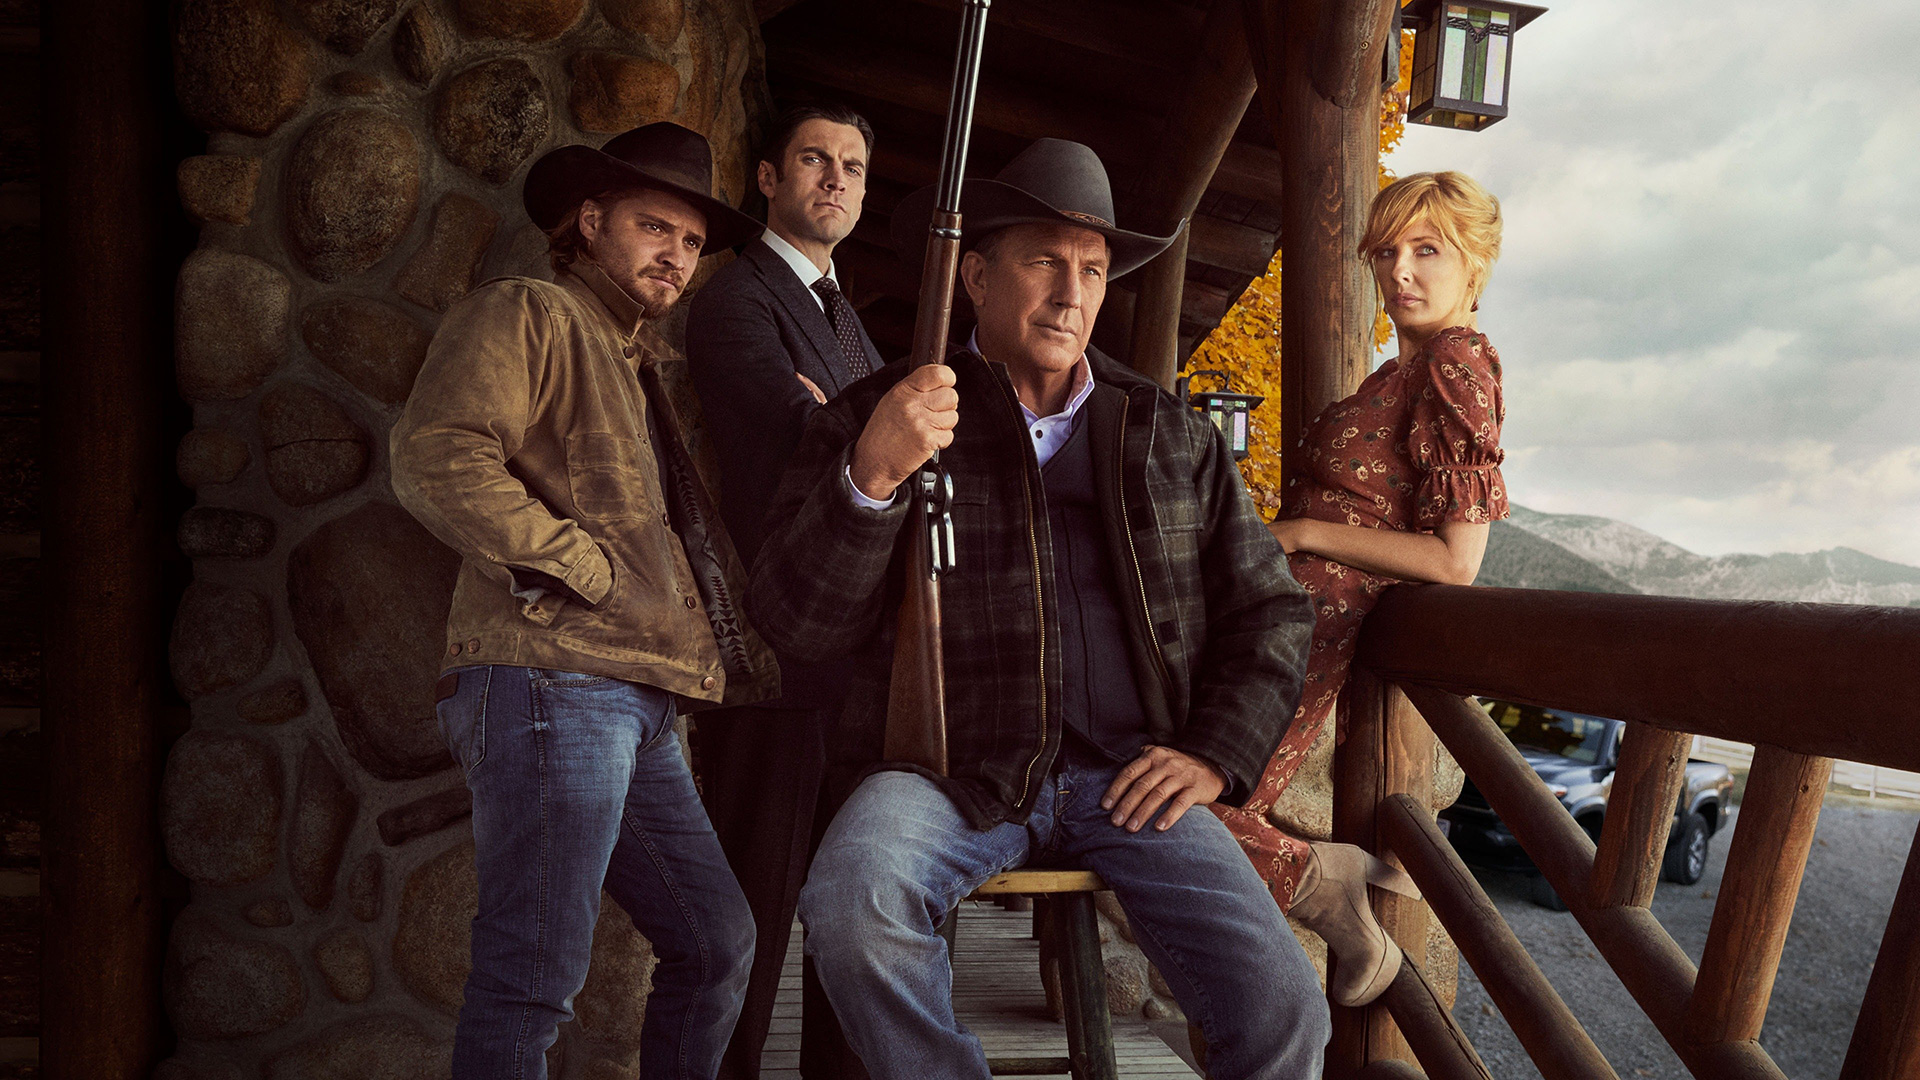 Dramaserie Yellowstone (2018) vanaf 20 juni bij Paramount Network